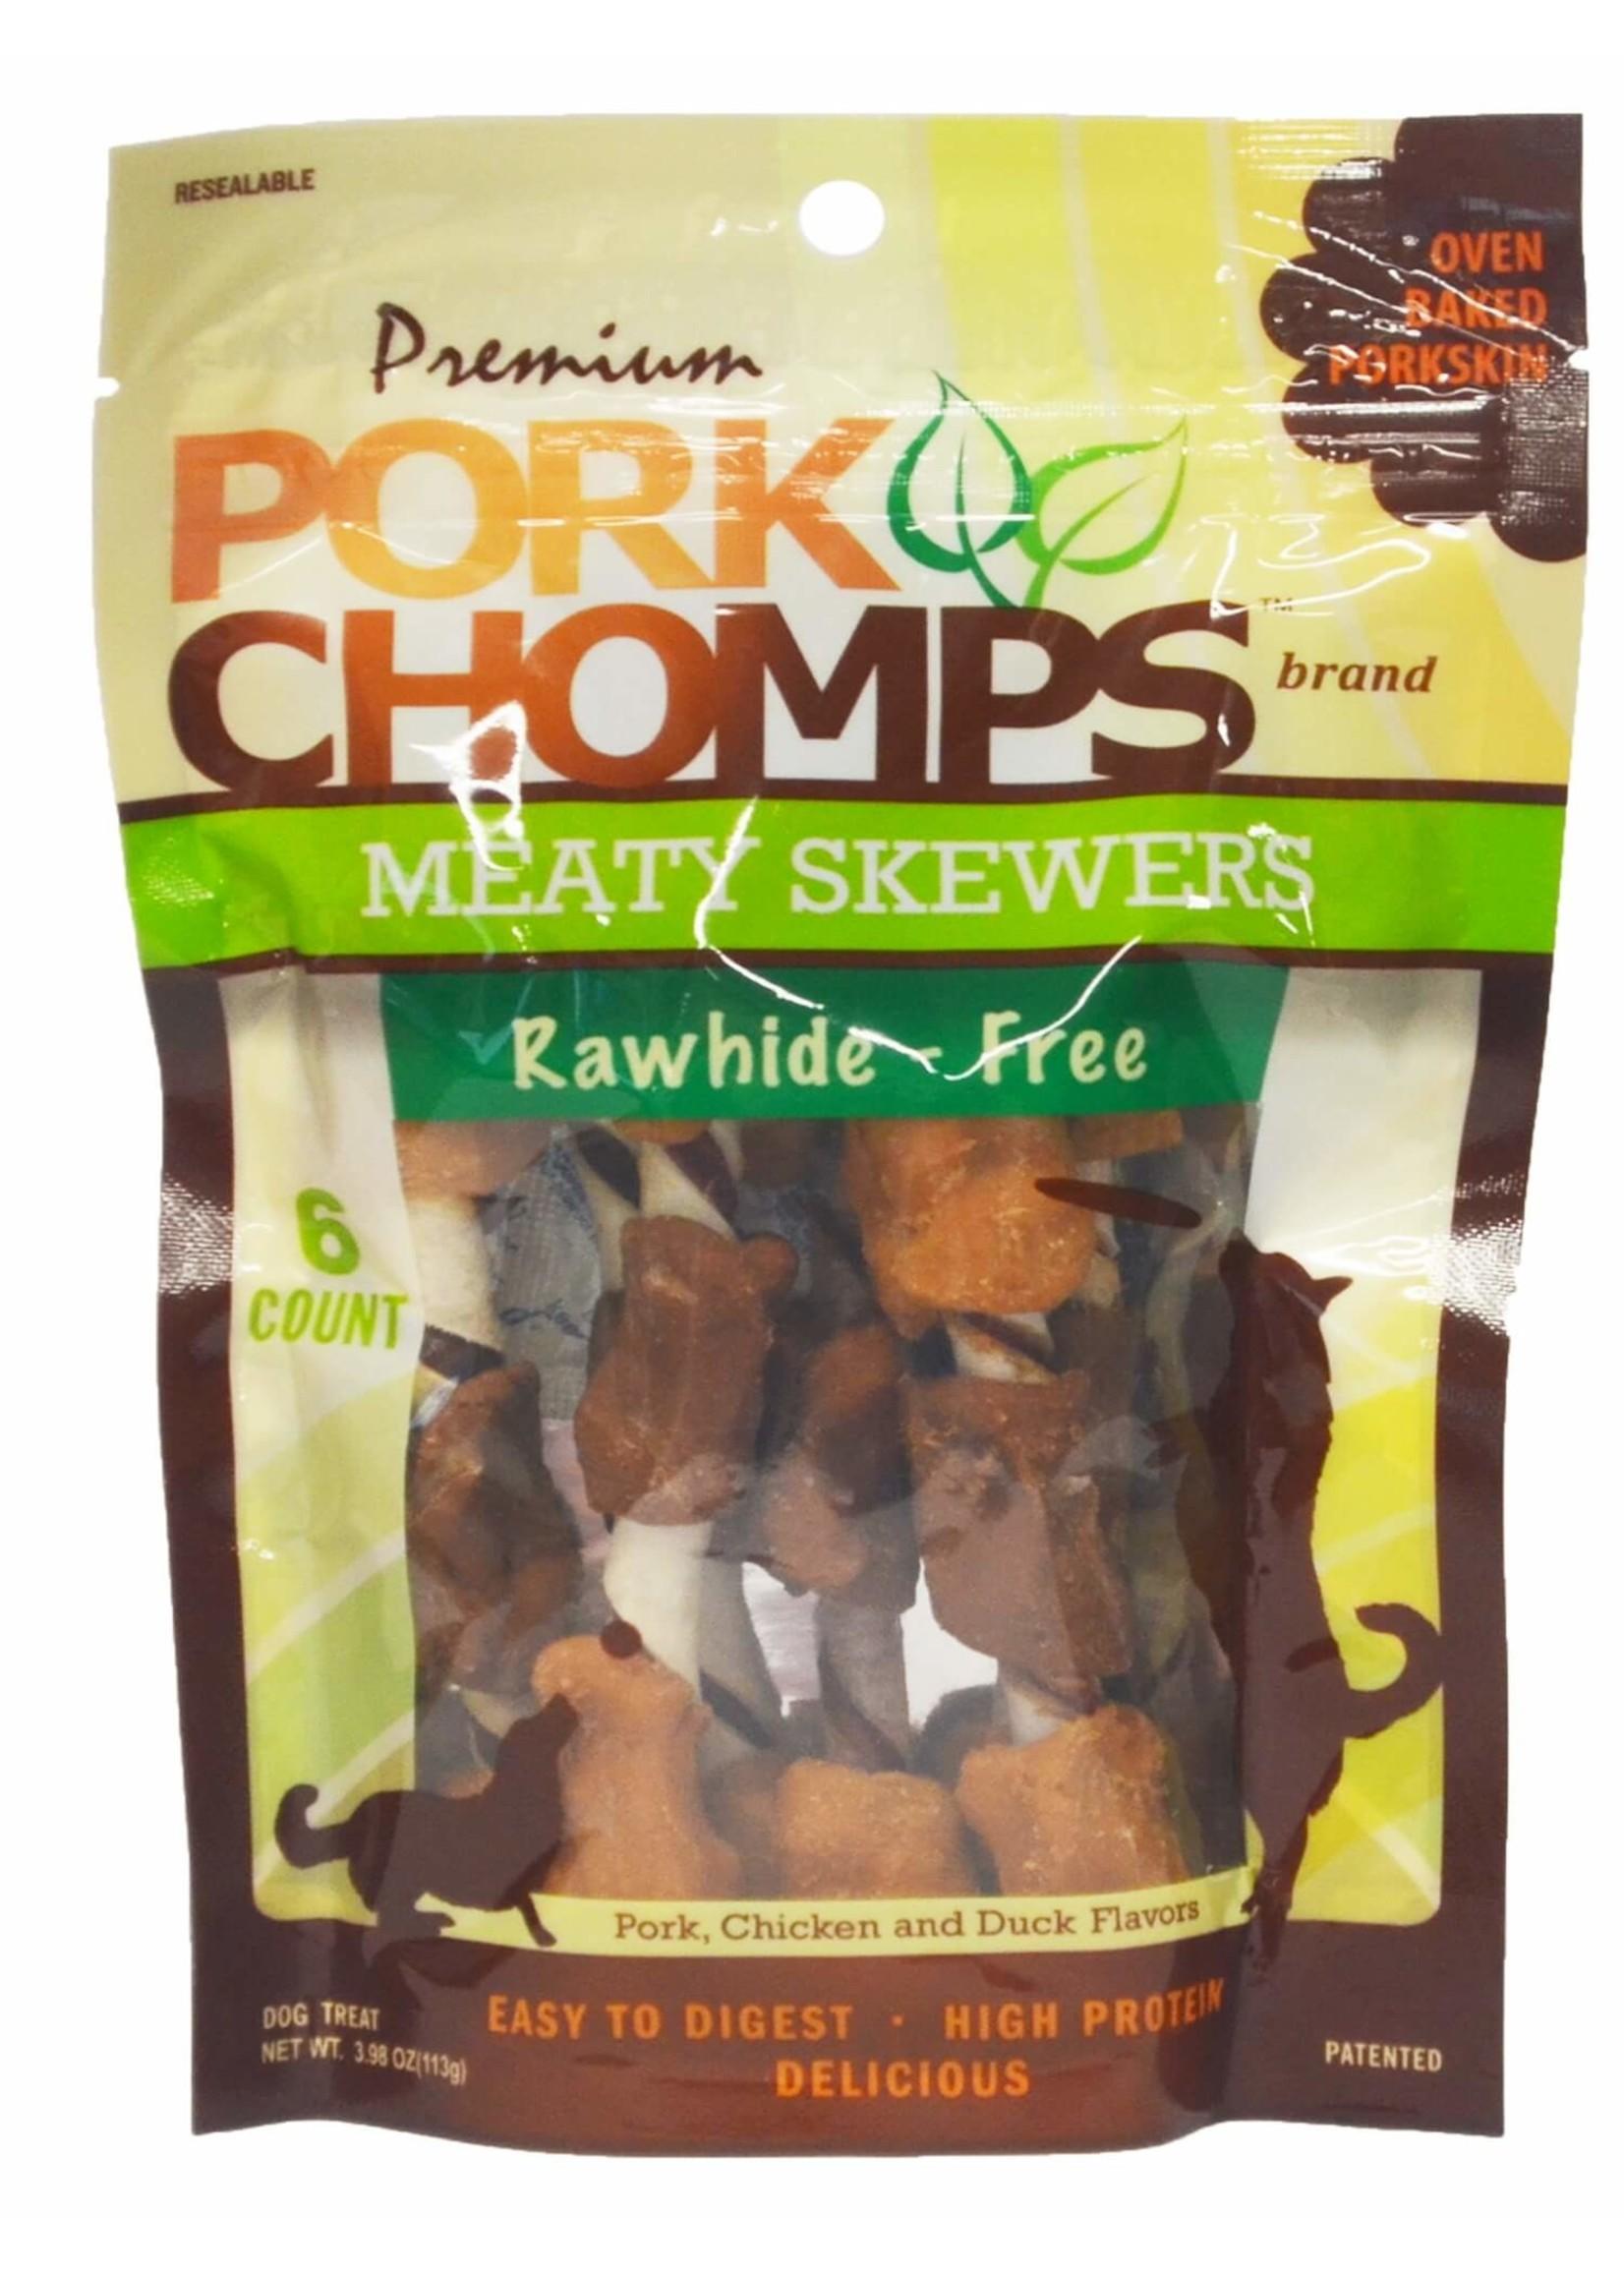 Pork Chomps Pork Chomps Meaty Skewers, 6ct